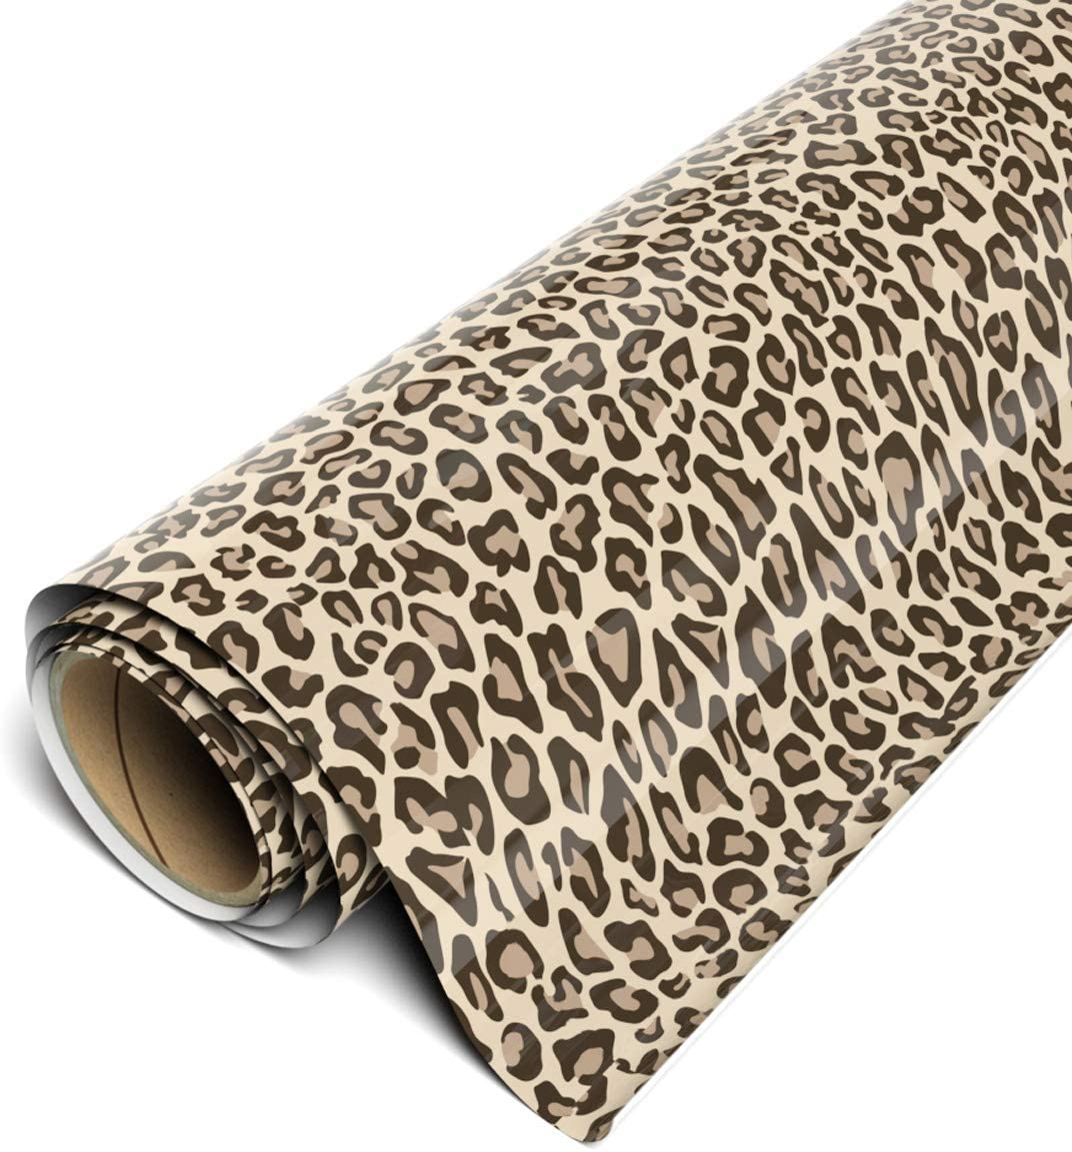 Siser Heat Transfer Vinyl Modern Leopard Animal Print Printed HTV Oracal Adhesive Craft Vinyl- 979 Pattern HTV